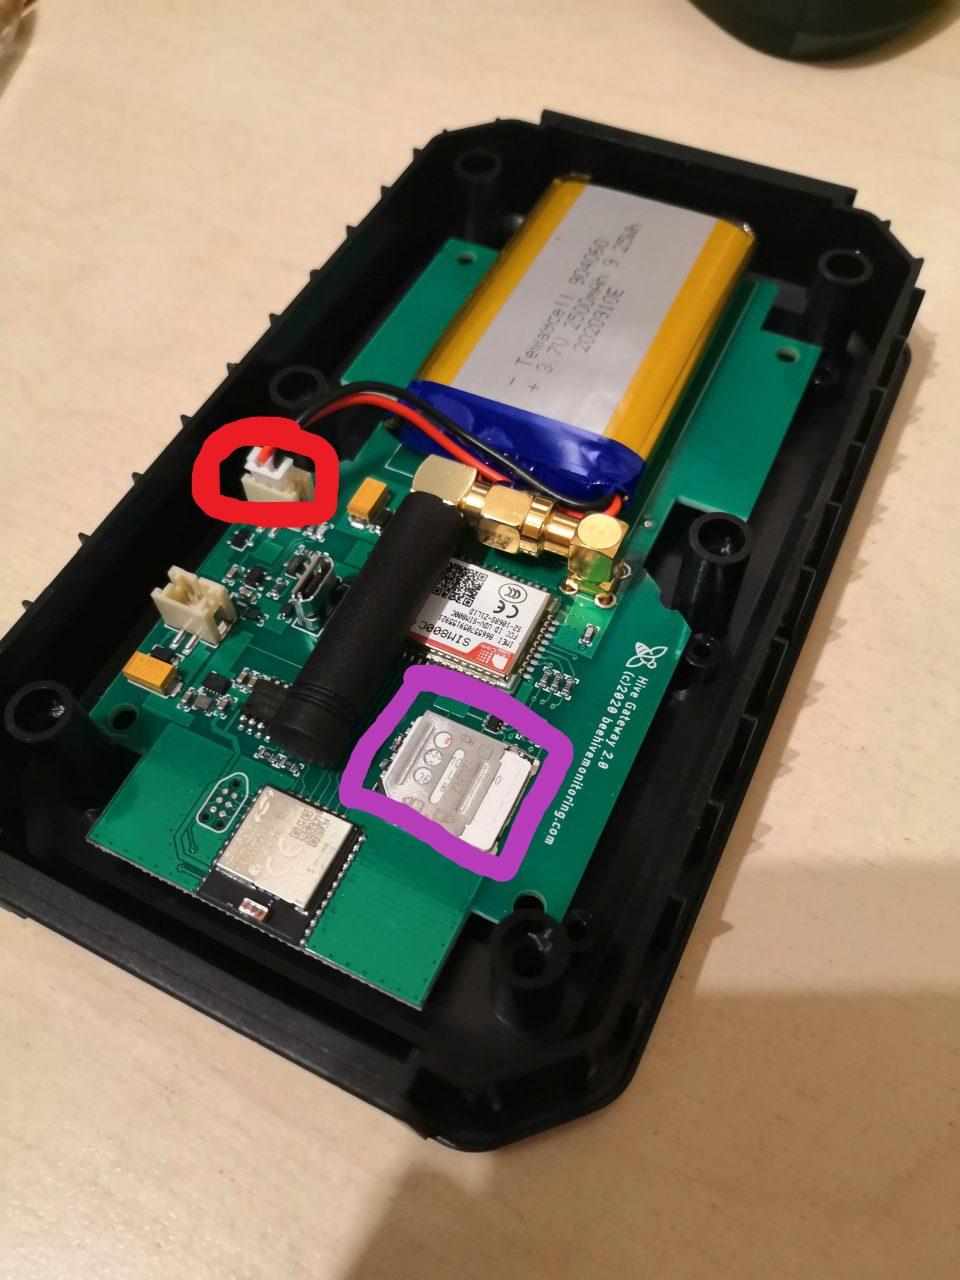 controller gsm aperto con indicazioni